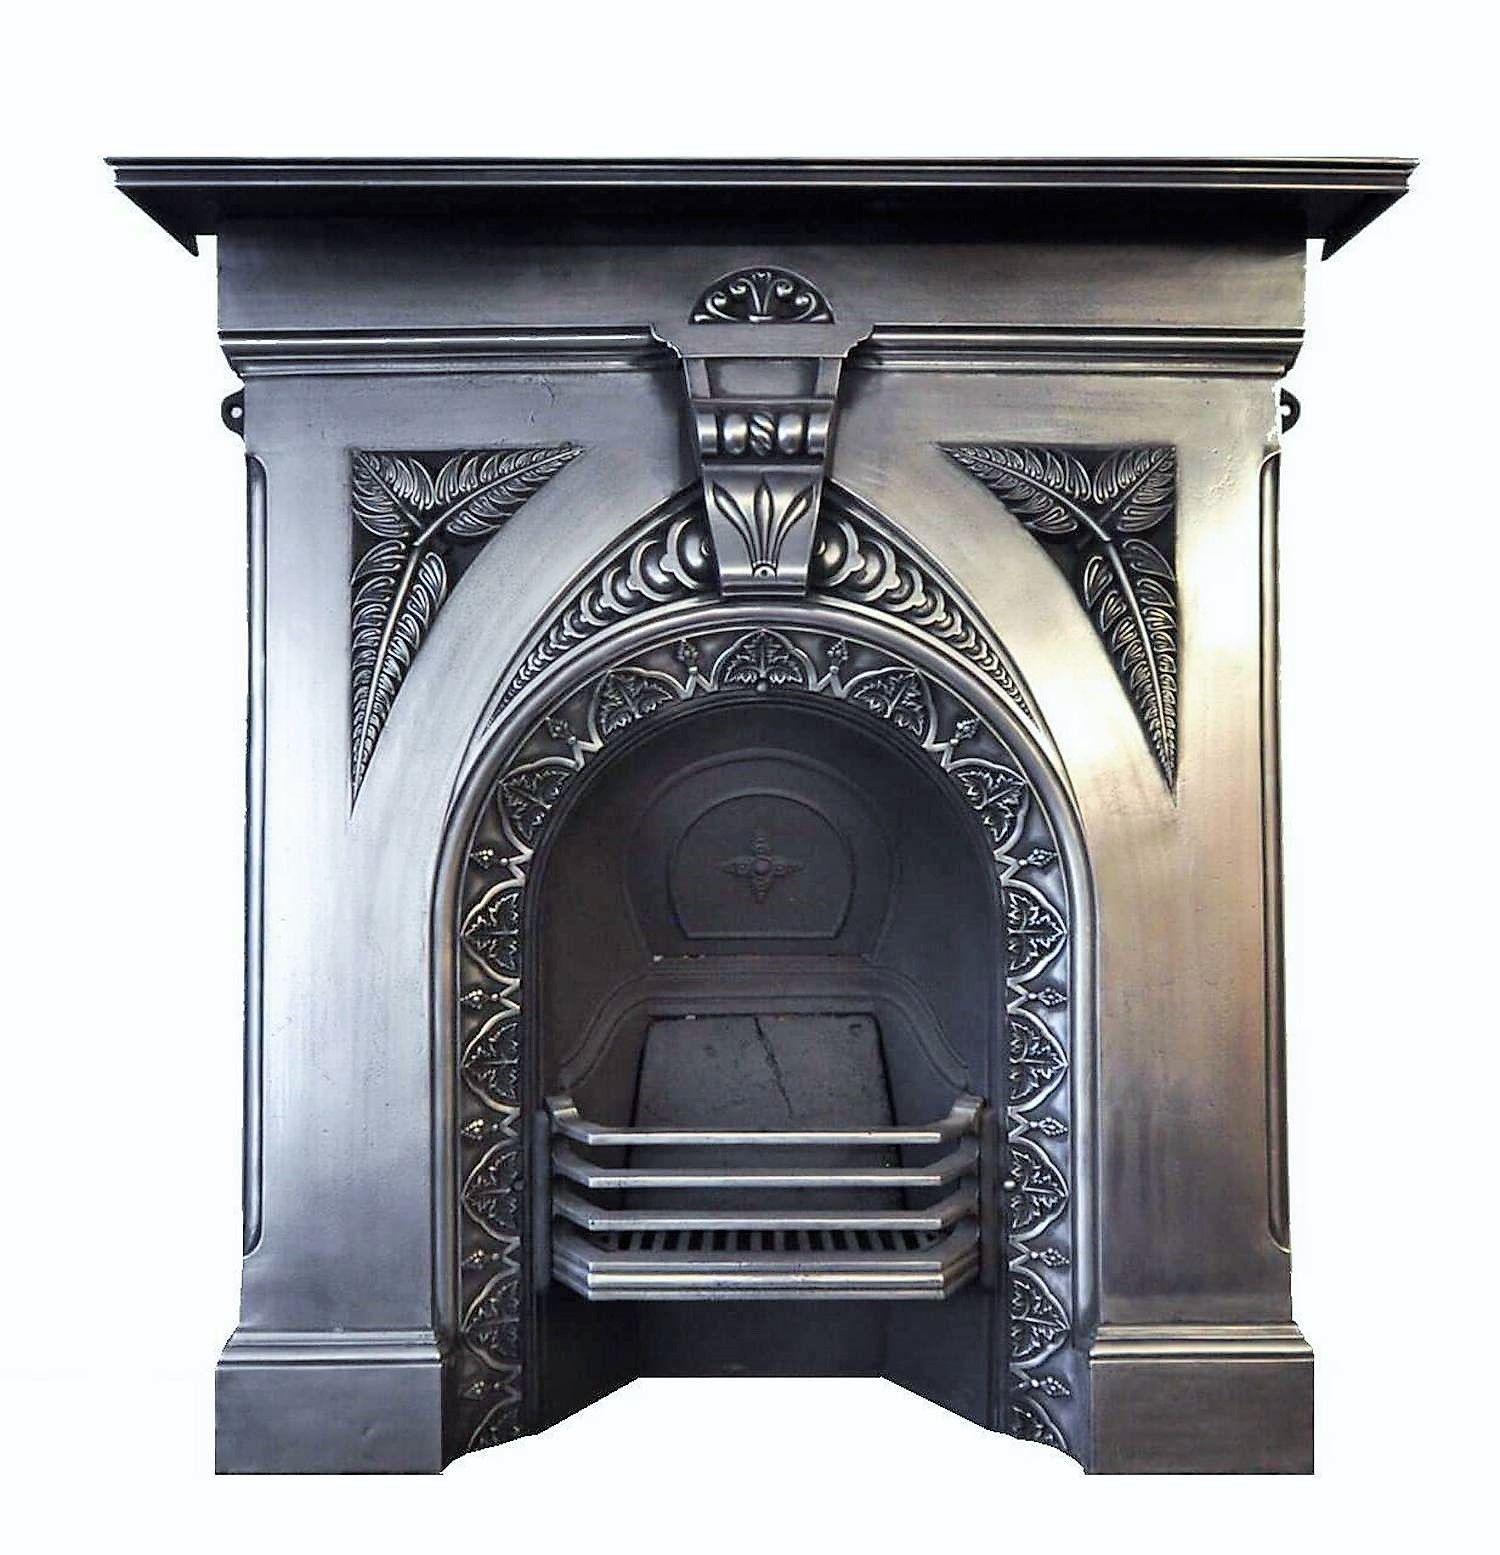 Original Victorian Fern Cast Iron Restored Fireplace Which Has